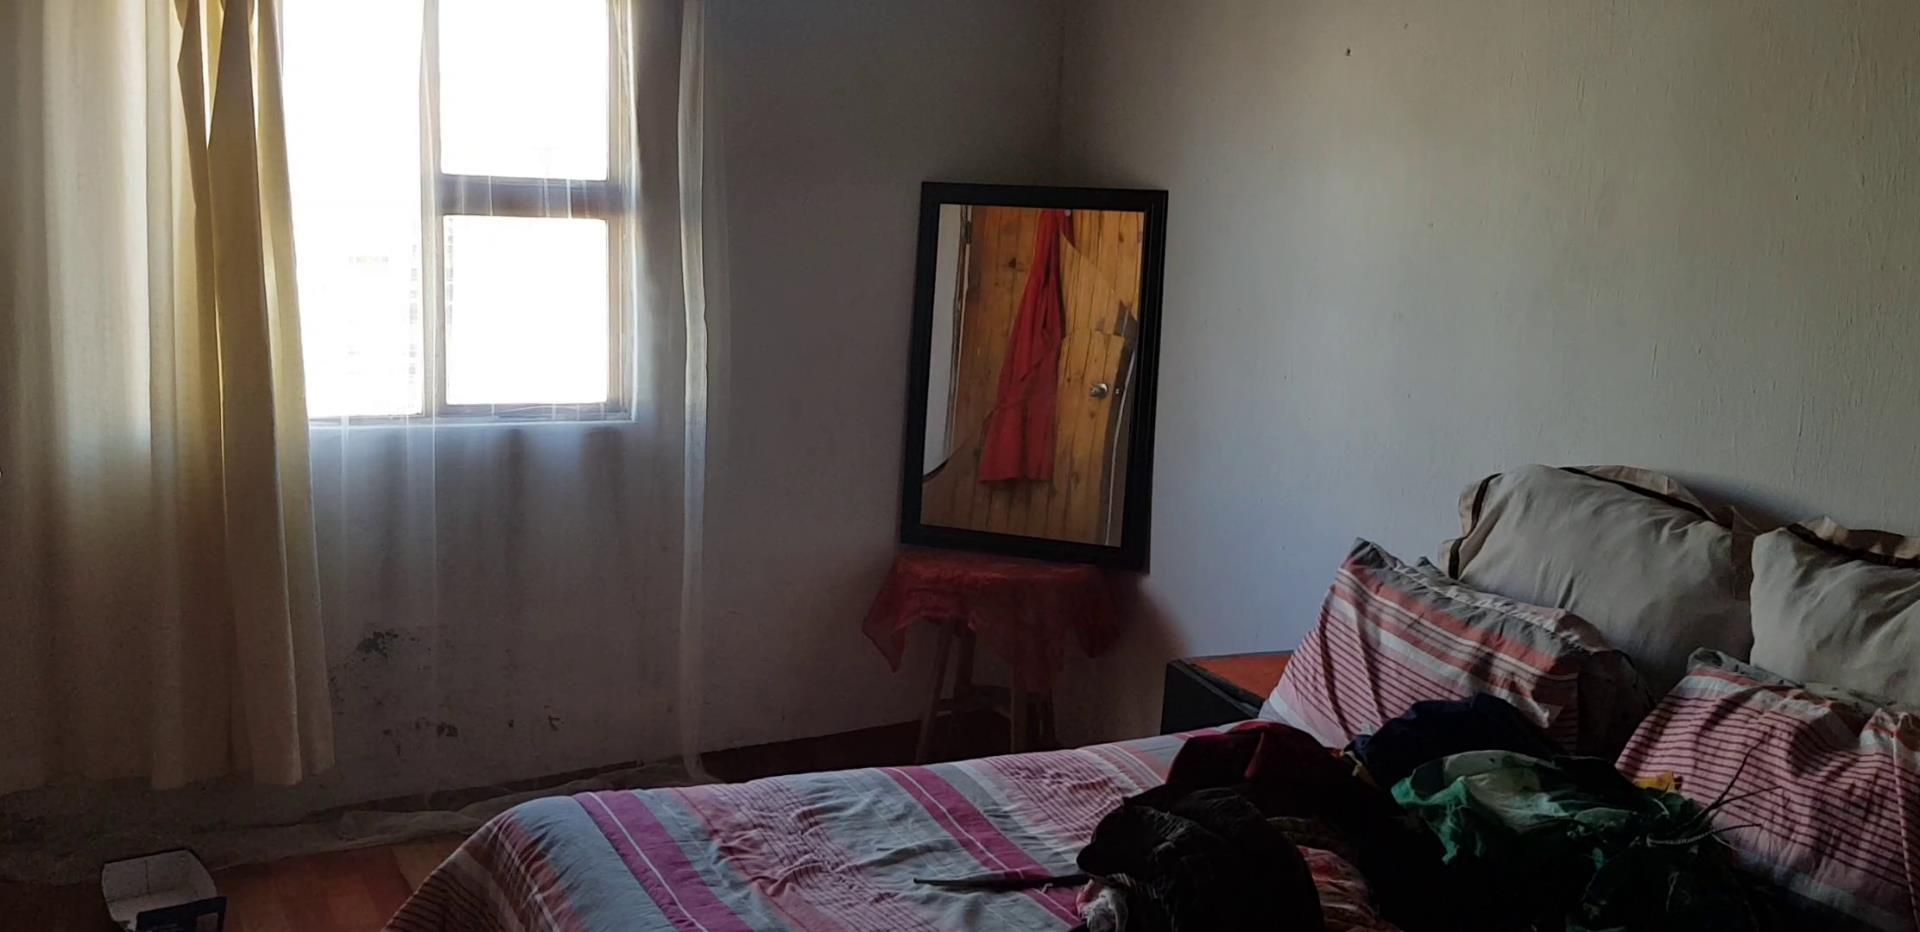 2 Bedroom House For Sale in Kwazakhele